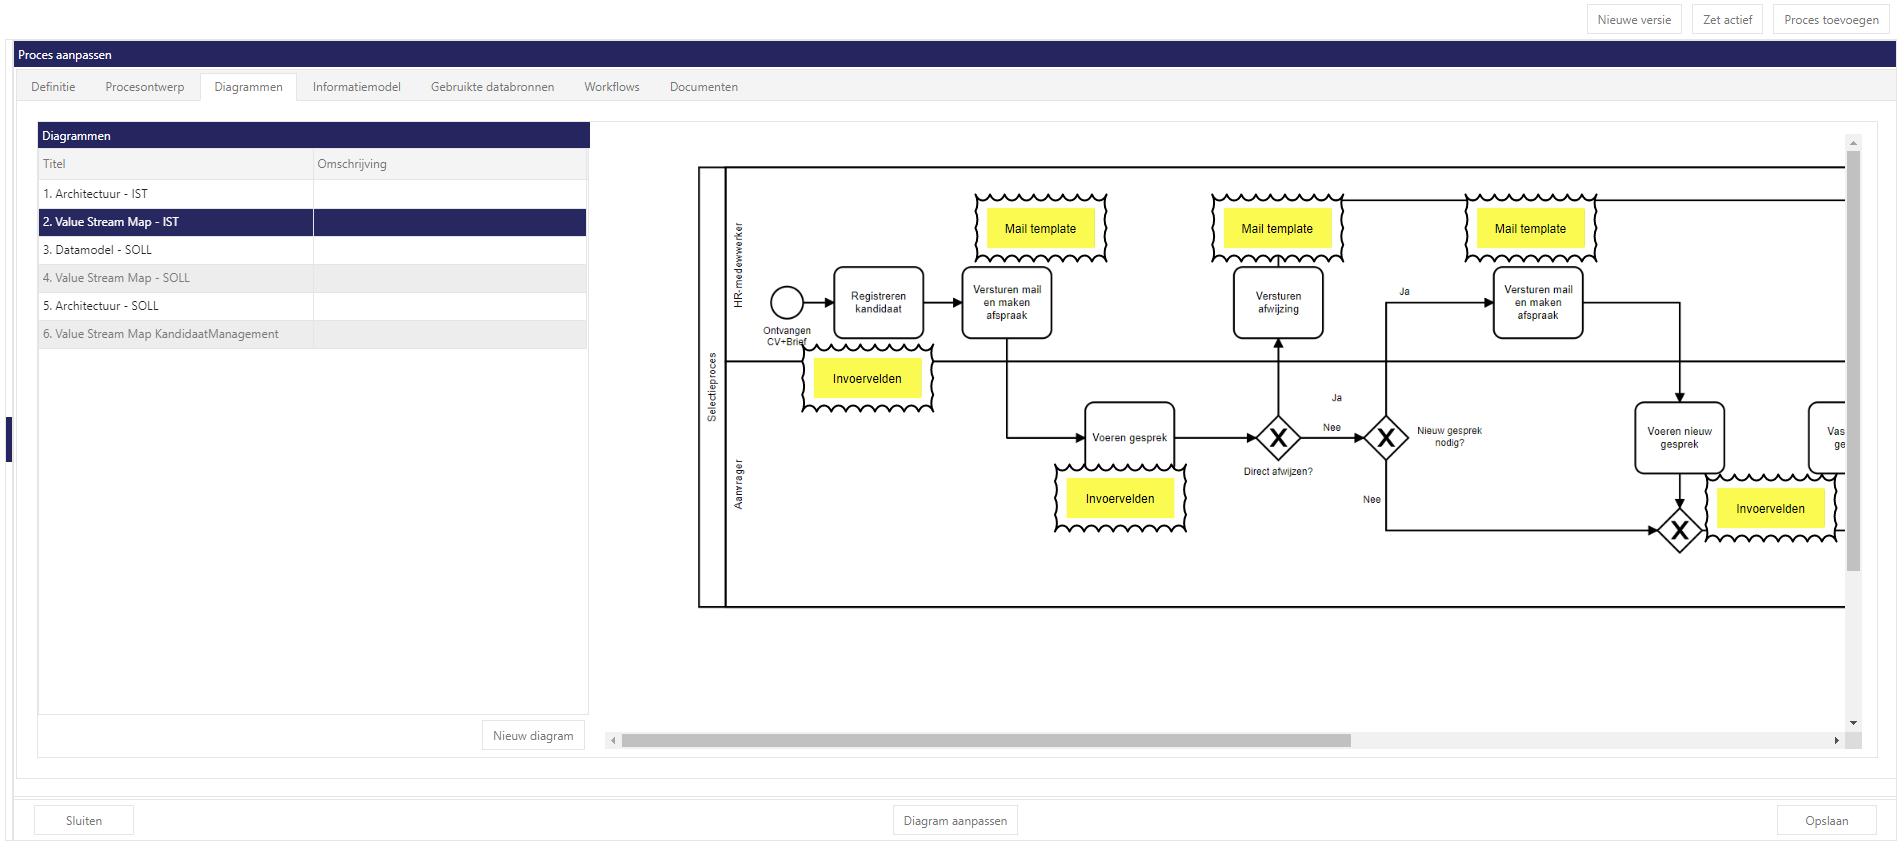 Siderian Cloud BPM - Diagrammen